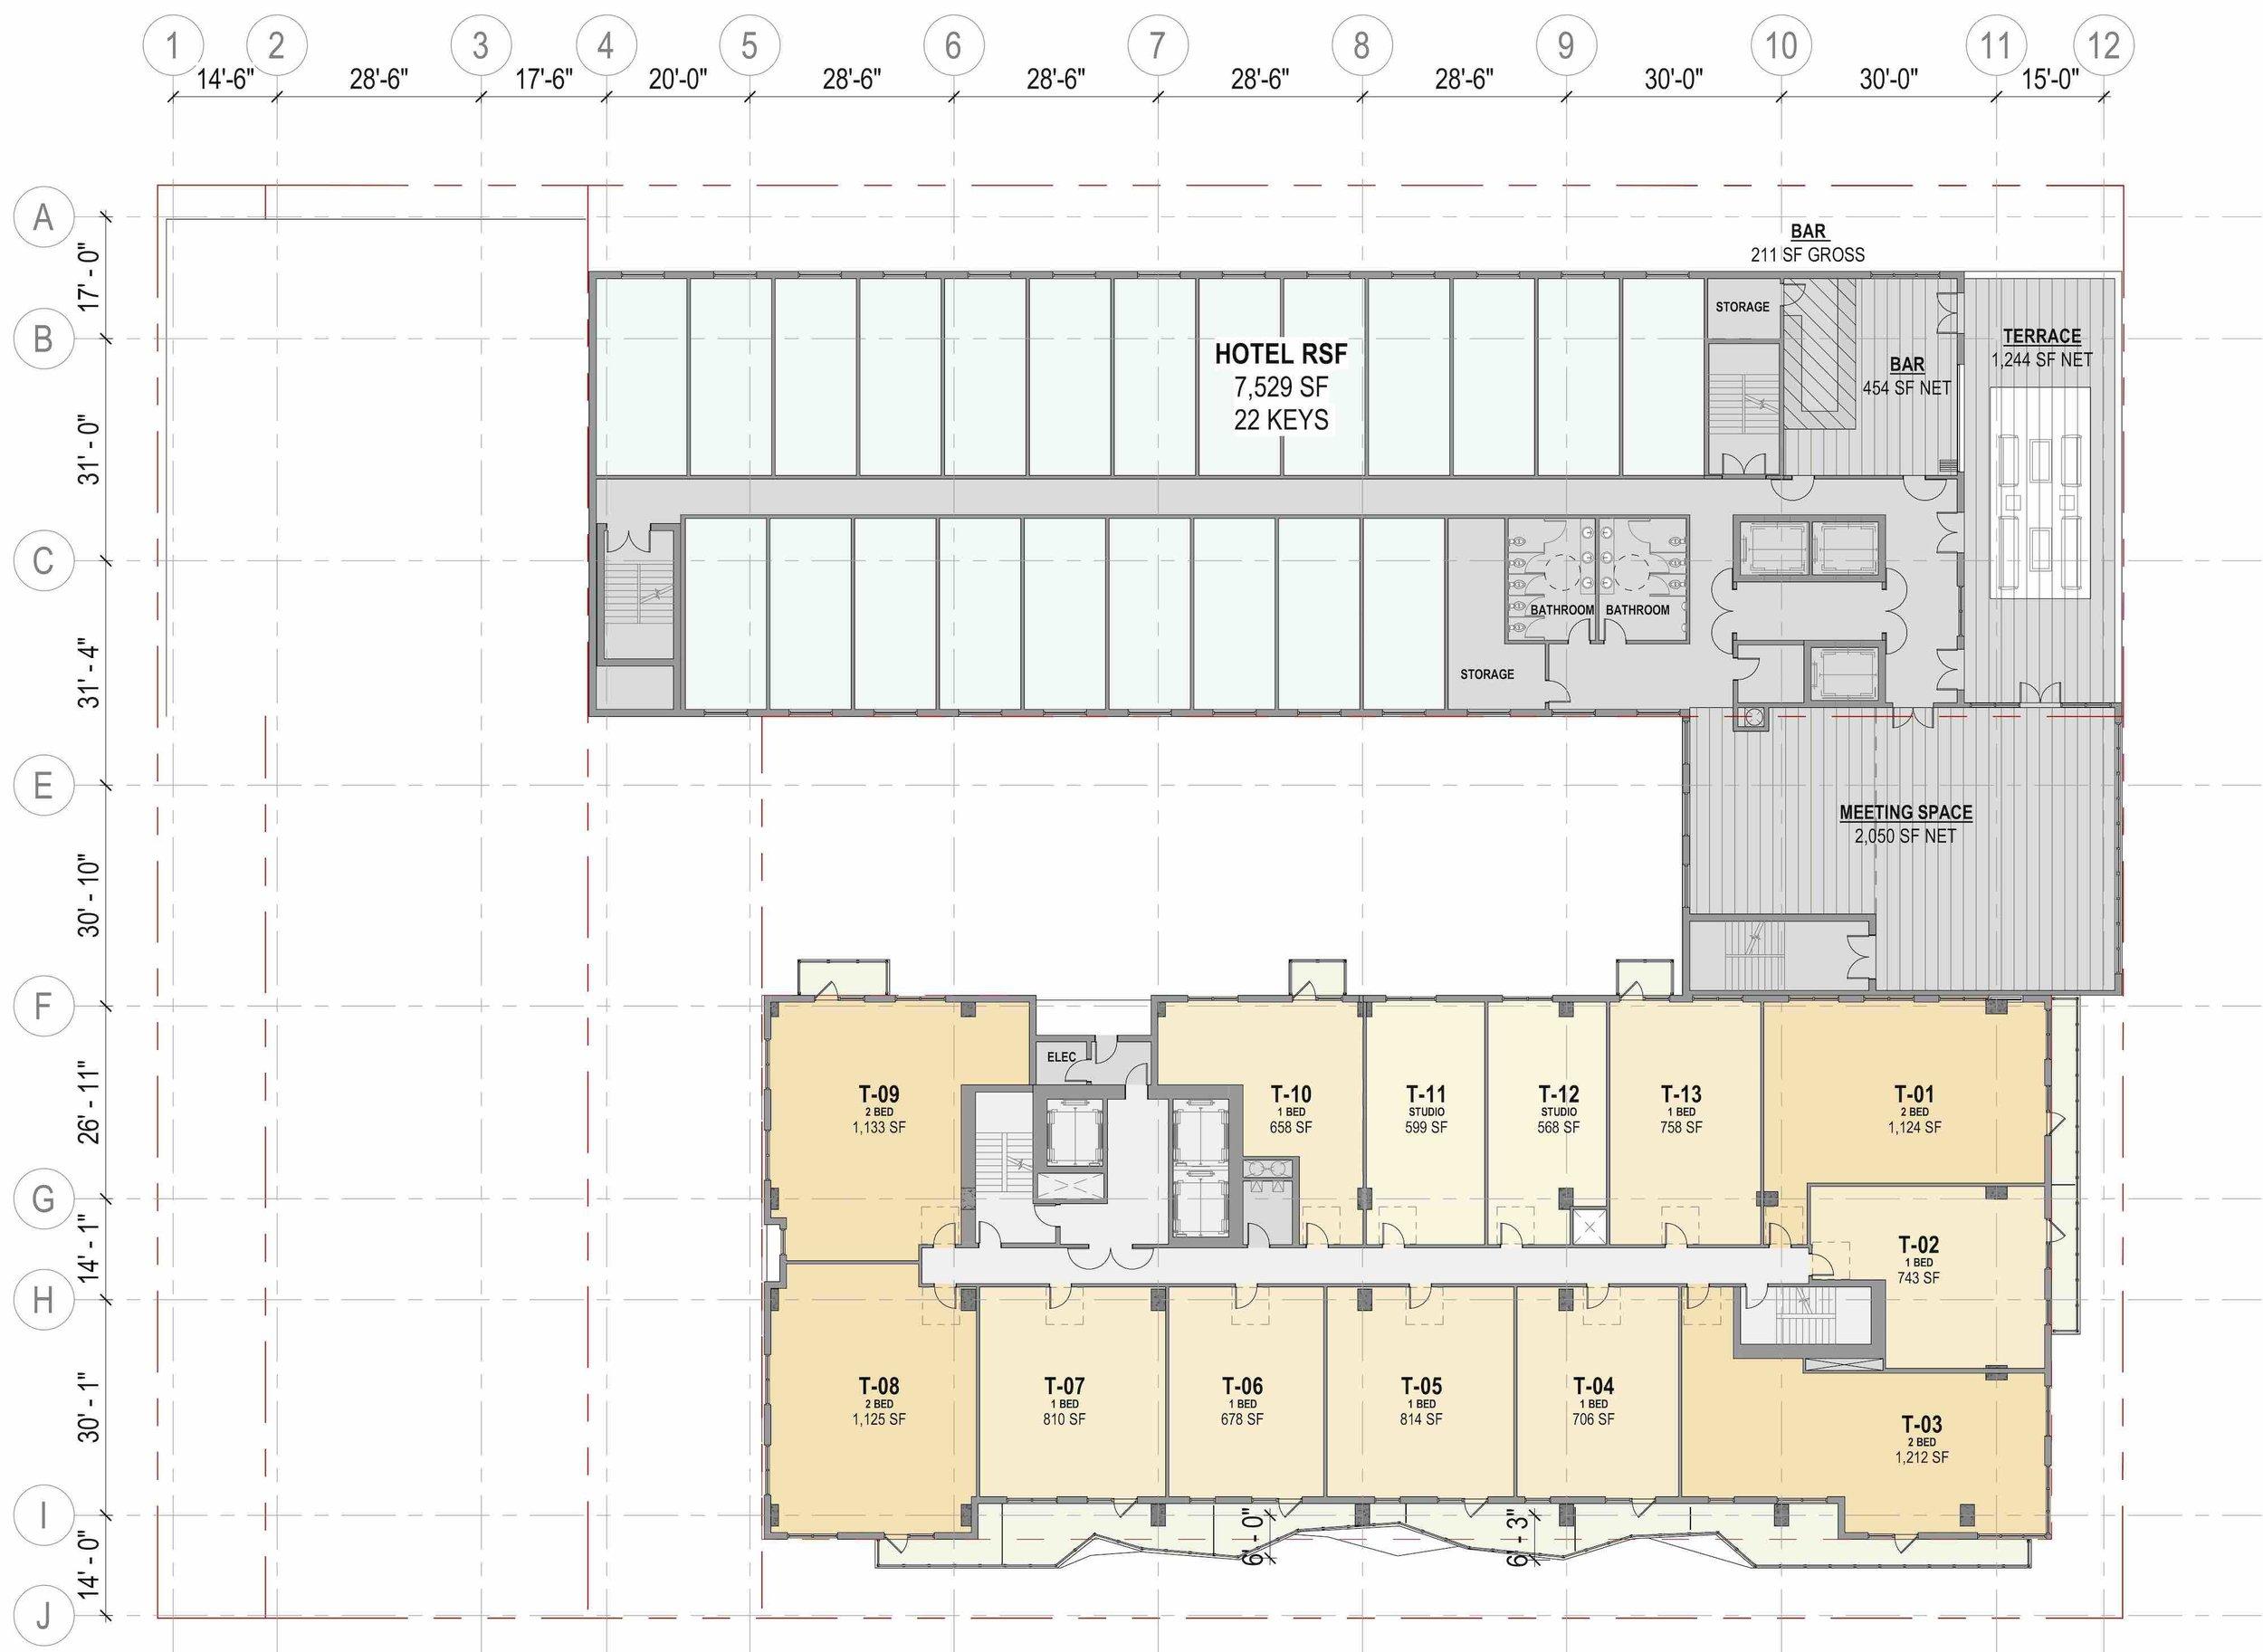 Ascent - Site Plan - 8th Fl (Hotel Am).jpg